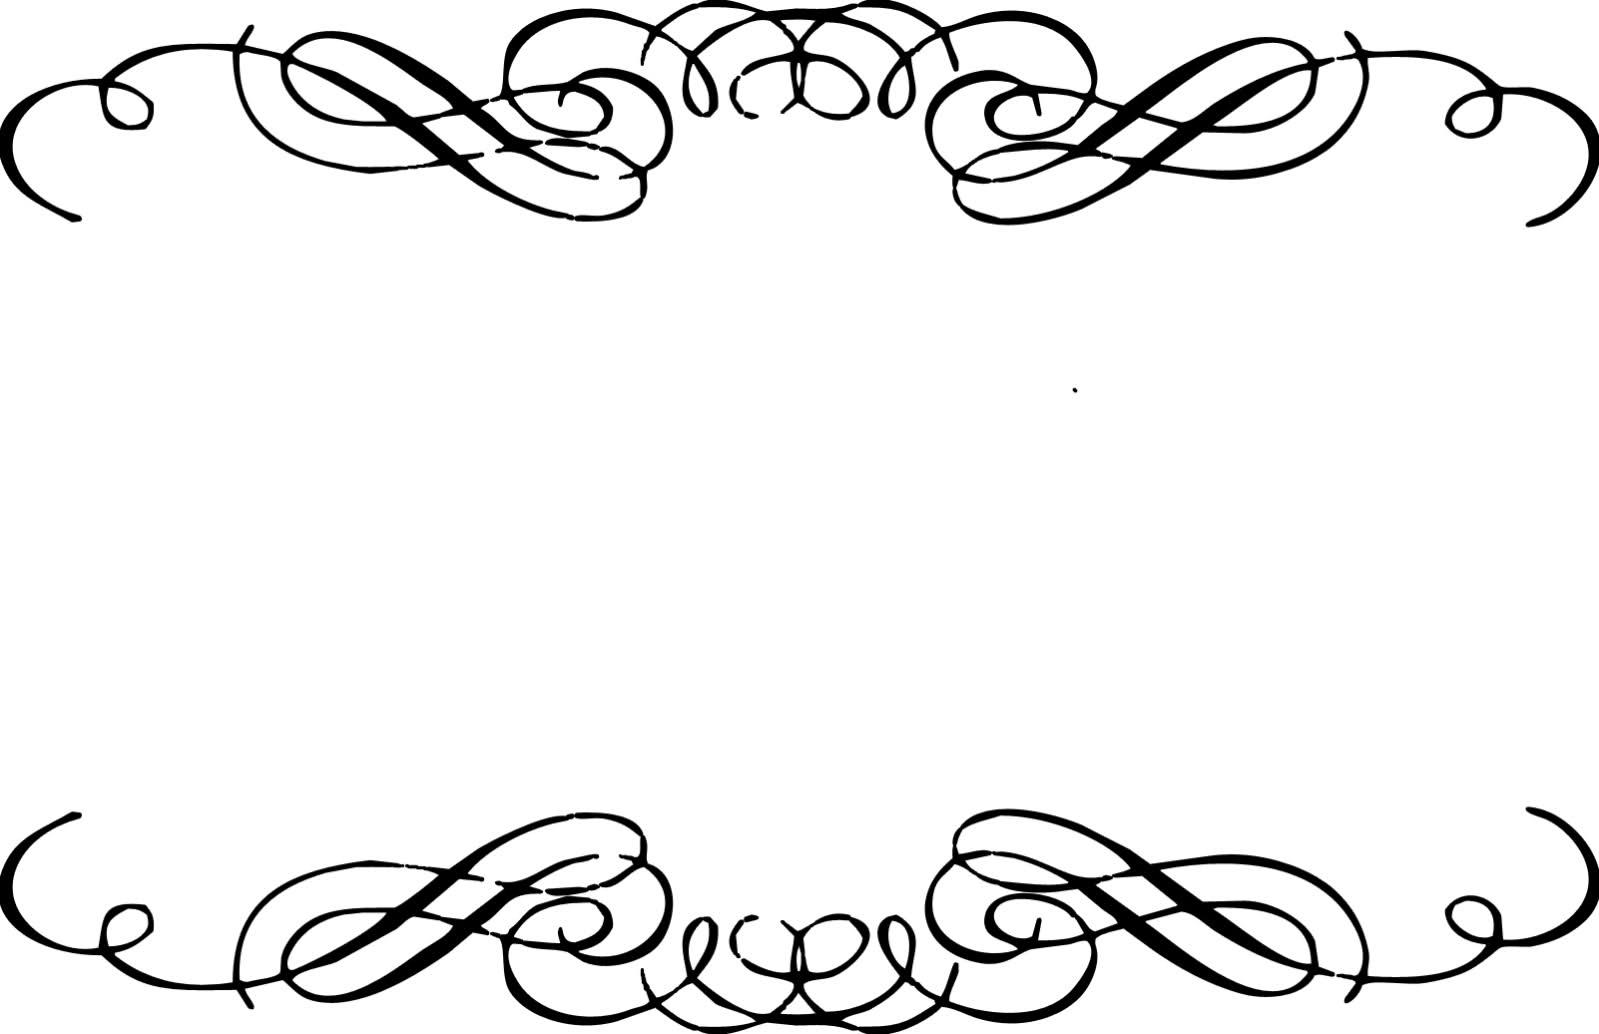 11 Corner Flourish Free Vector Free Clip-11 Corner Flourish Free Vector Free Cliparts That You Can Download To-1